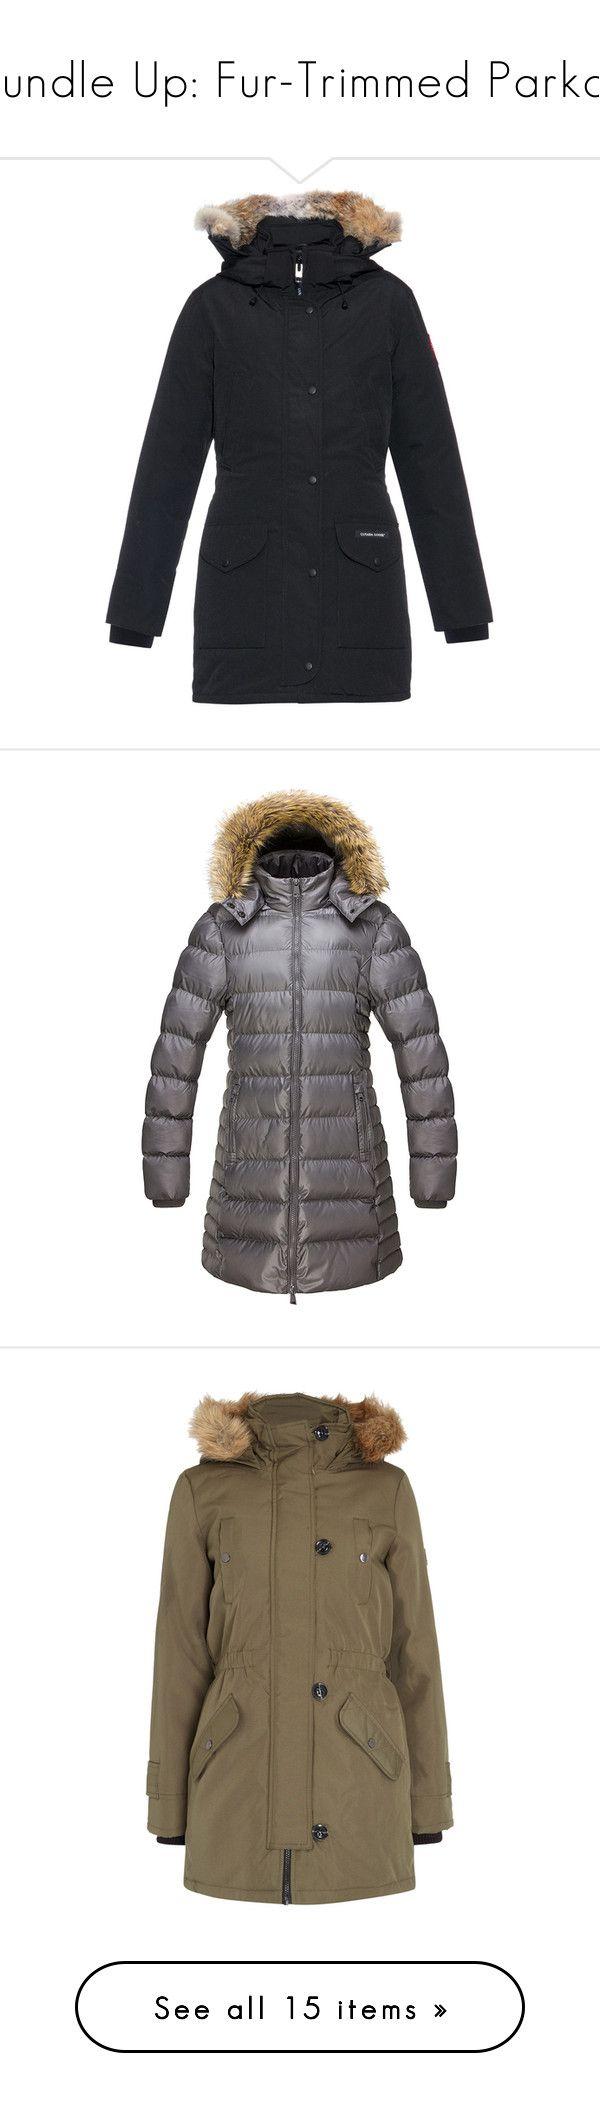 """Bundle Up: Fur-Trimmed Parkas"" by polyvore-editorial ❤ liked on Polyvore featuring parkas, outerwear, coats, black, black coat, black parka, fur trim hooded coat, hooded parka, fur trim hooded parka and puffer coat"